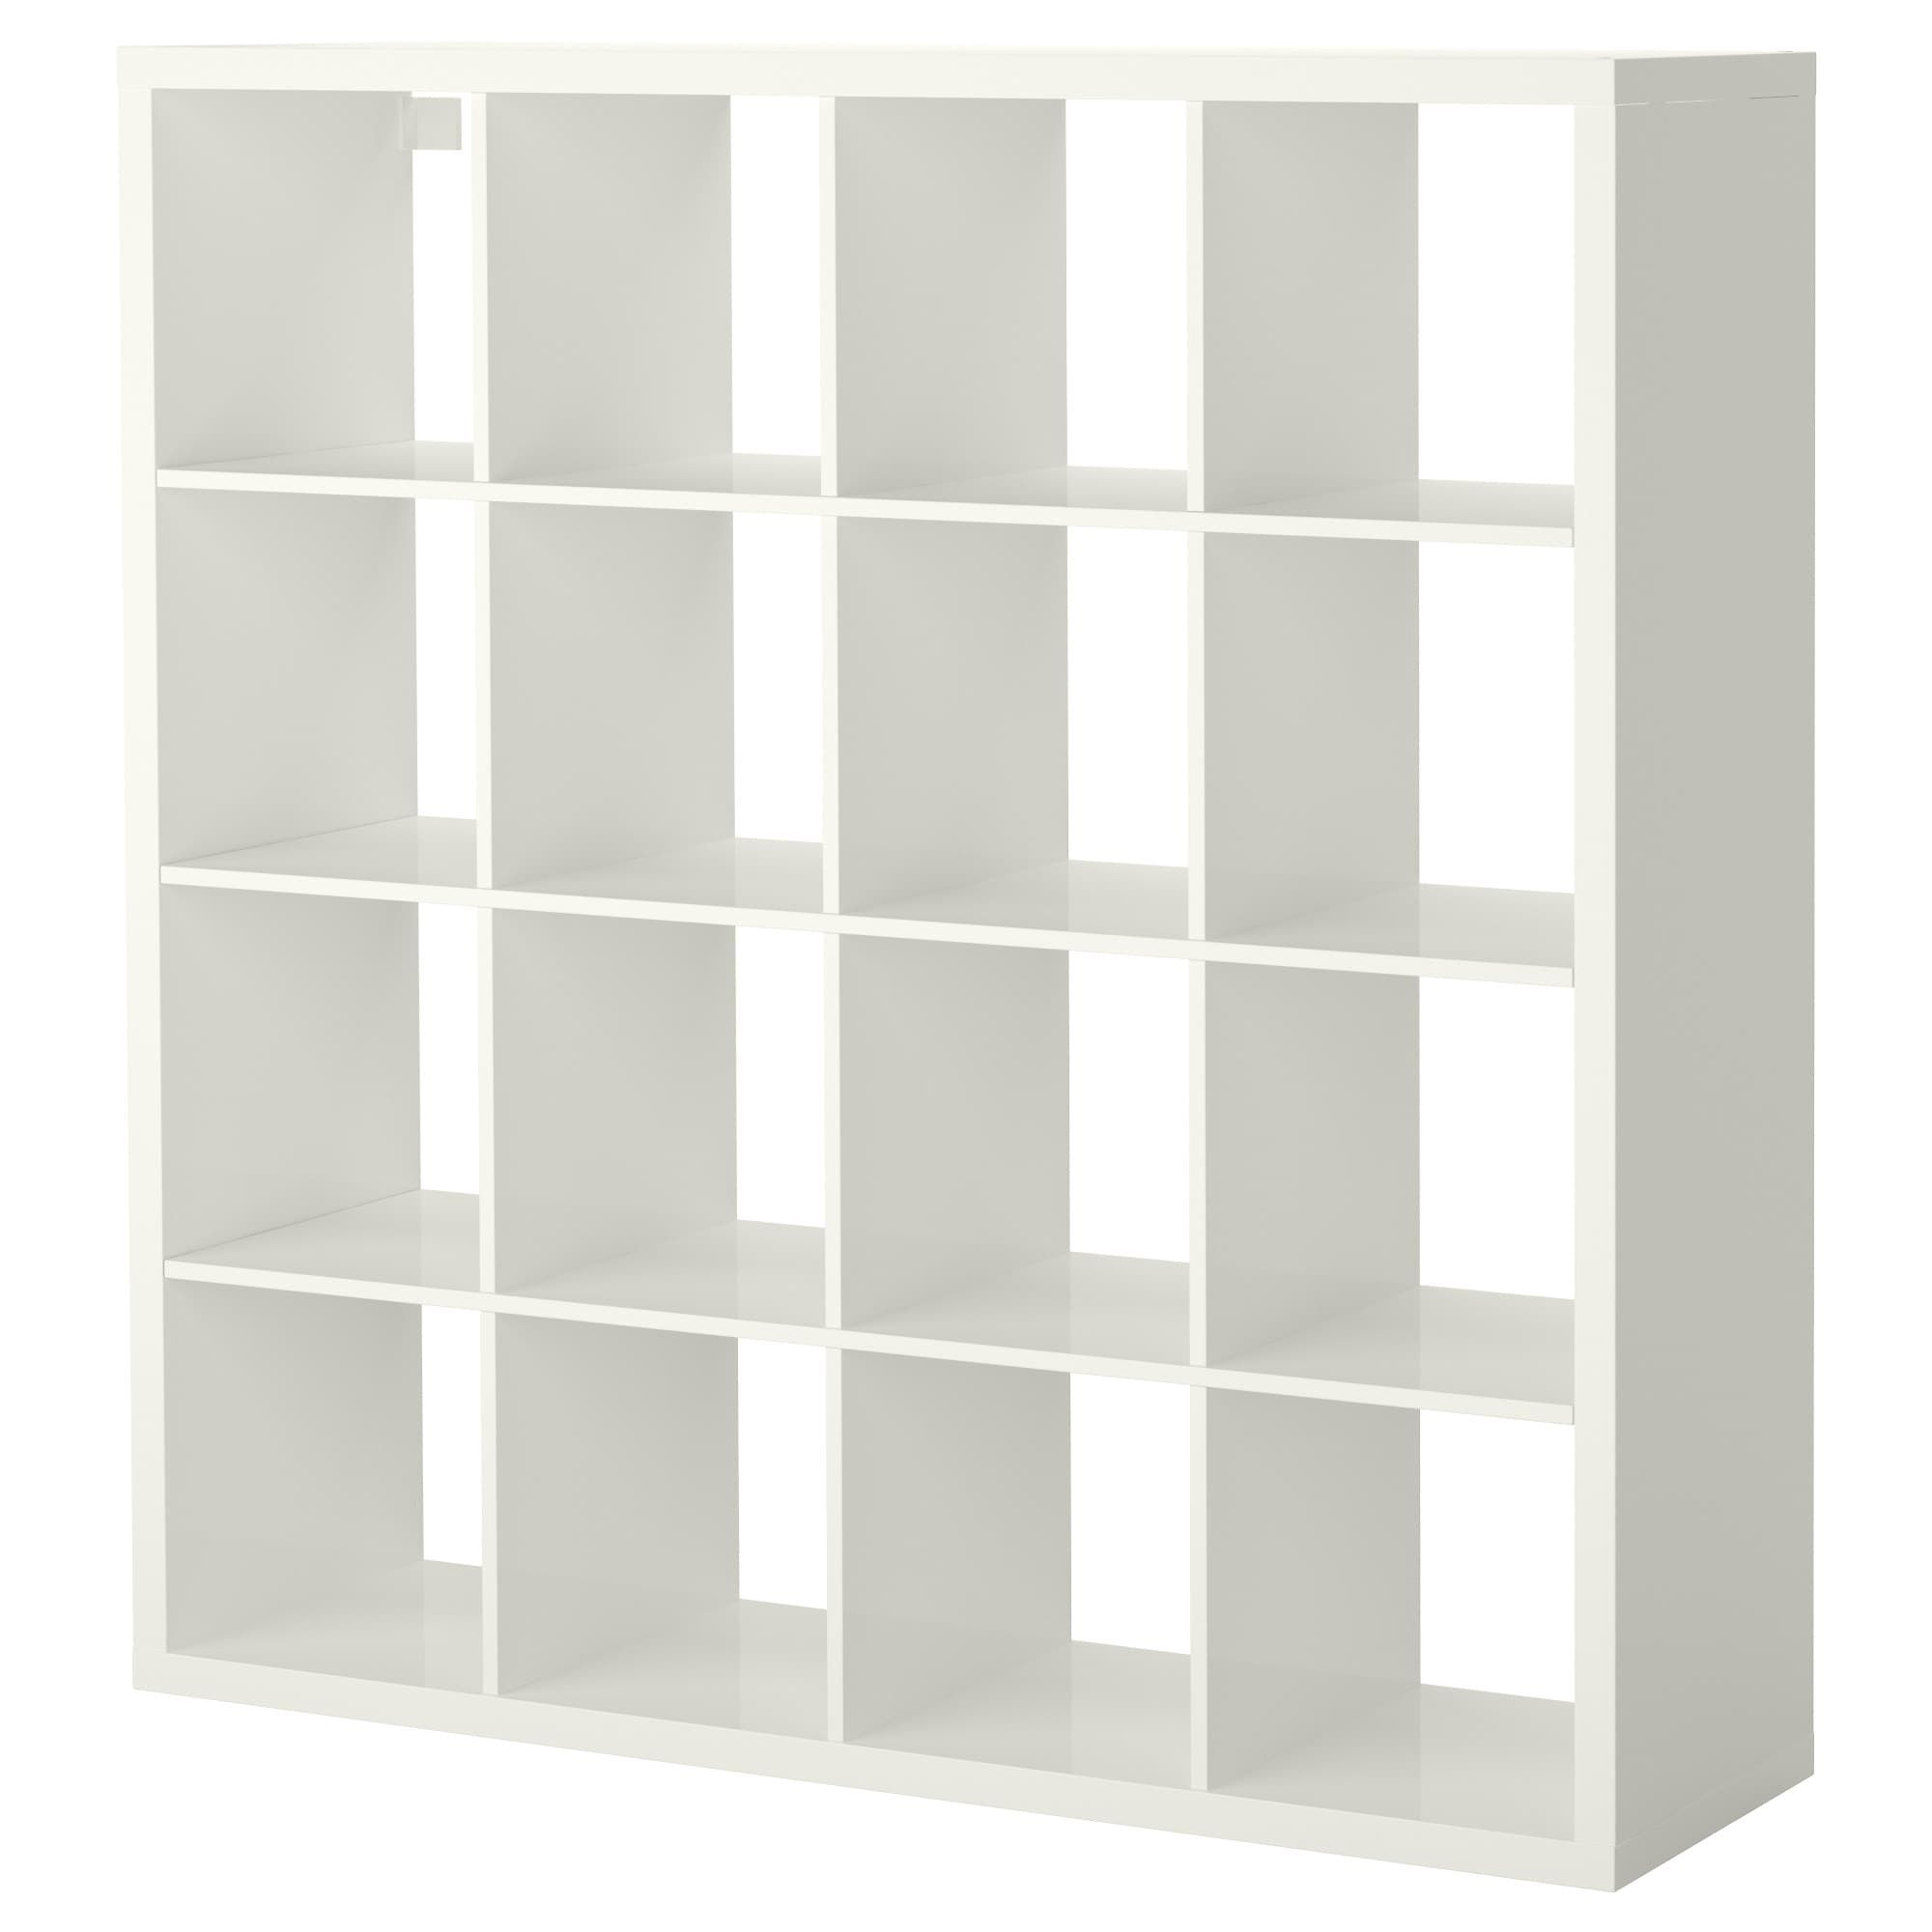 Kallax Shelf Unit High Gloss White 57 7 8x57 7 8 Ikea In 2020